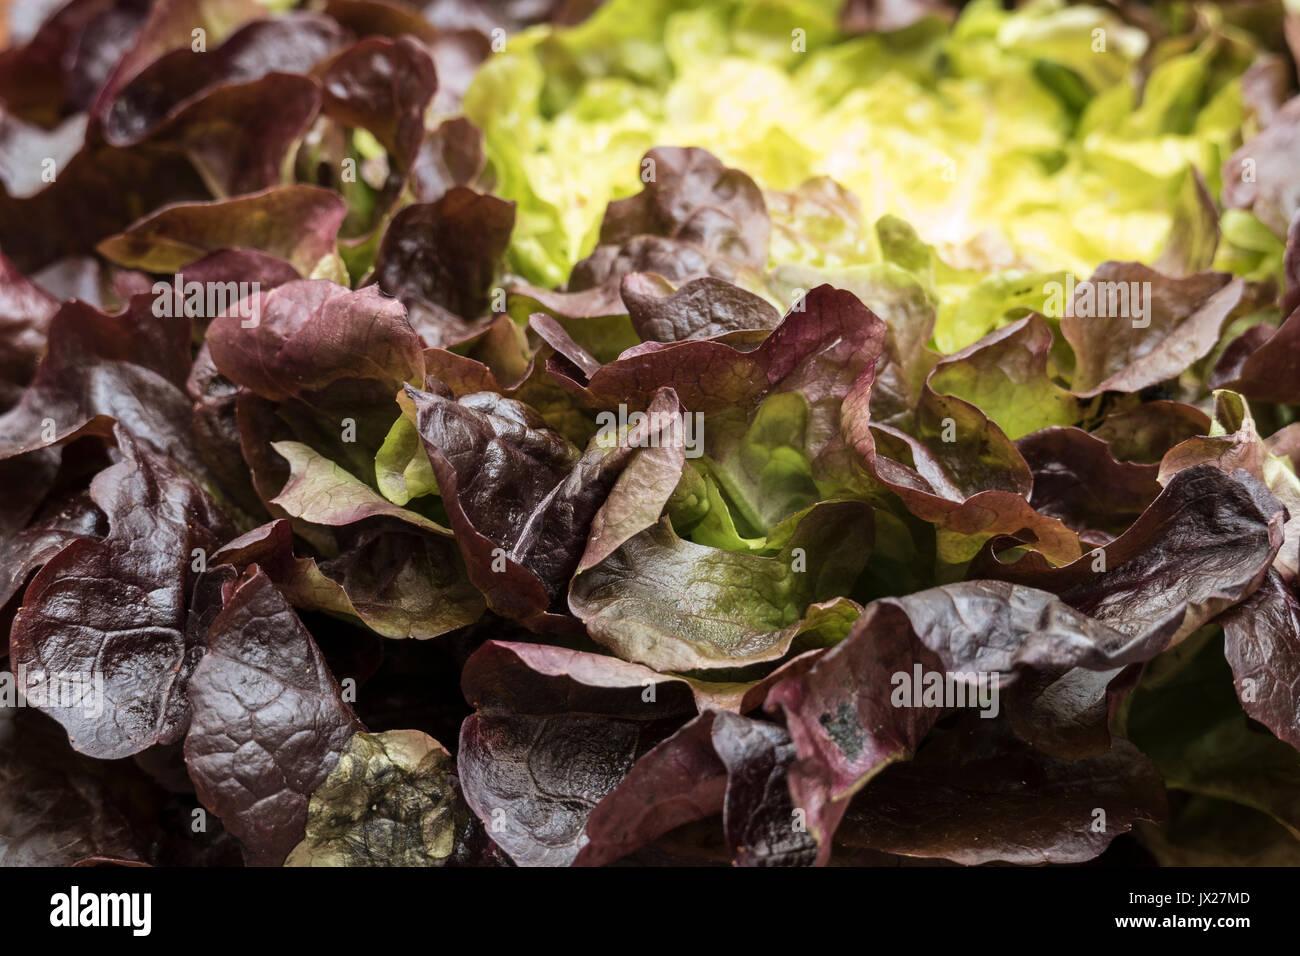 Bio organic red oak leaf lettuce closeup view in natural light - Stock Image